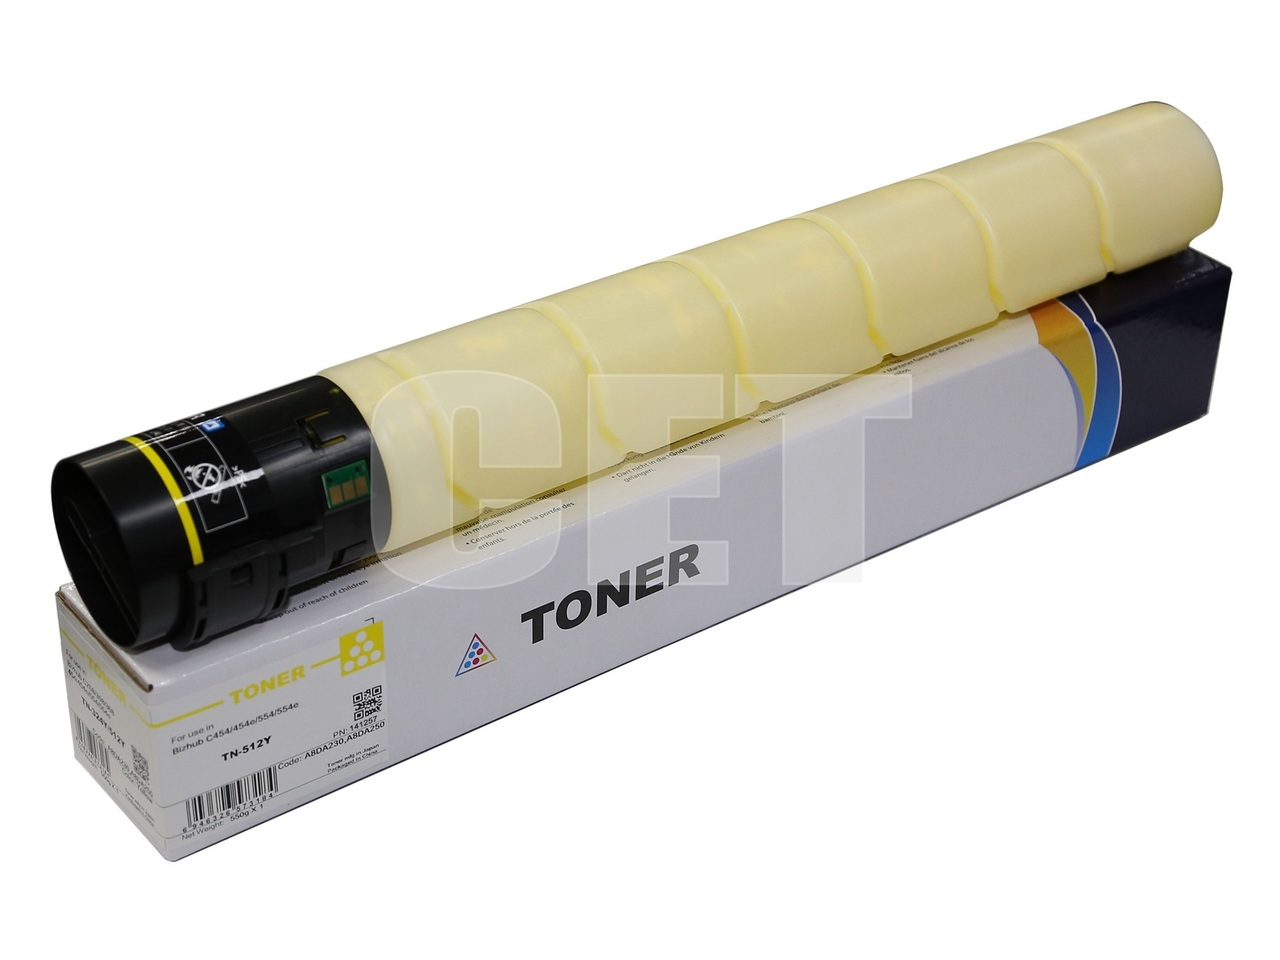 Тонер-картридж (CPT) TN-512Y для KONICA MINOLTA BizhubC454/554/454e/554e (CET) Yellow, 514г, 26000 стр., CET141257